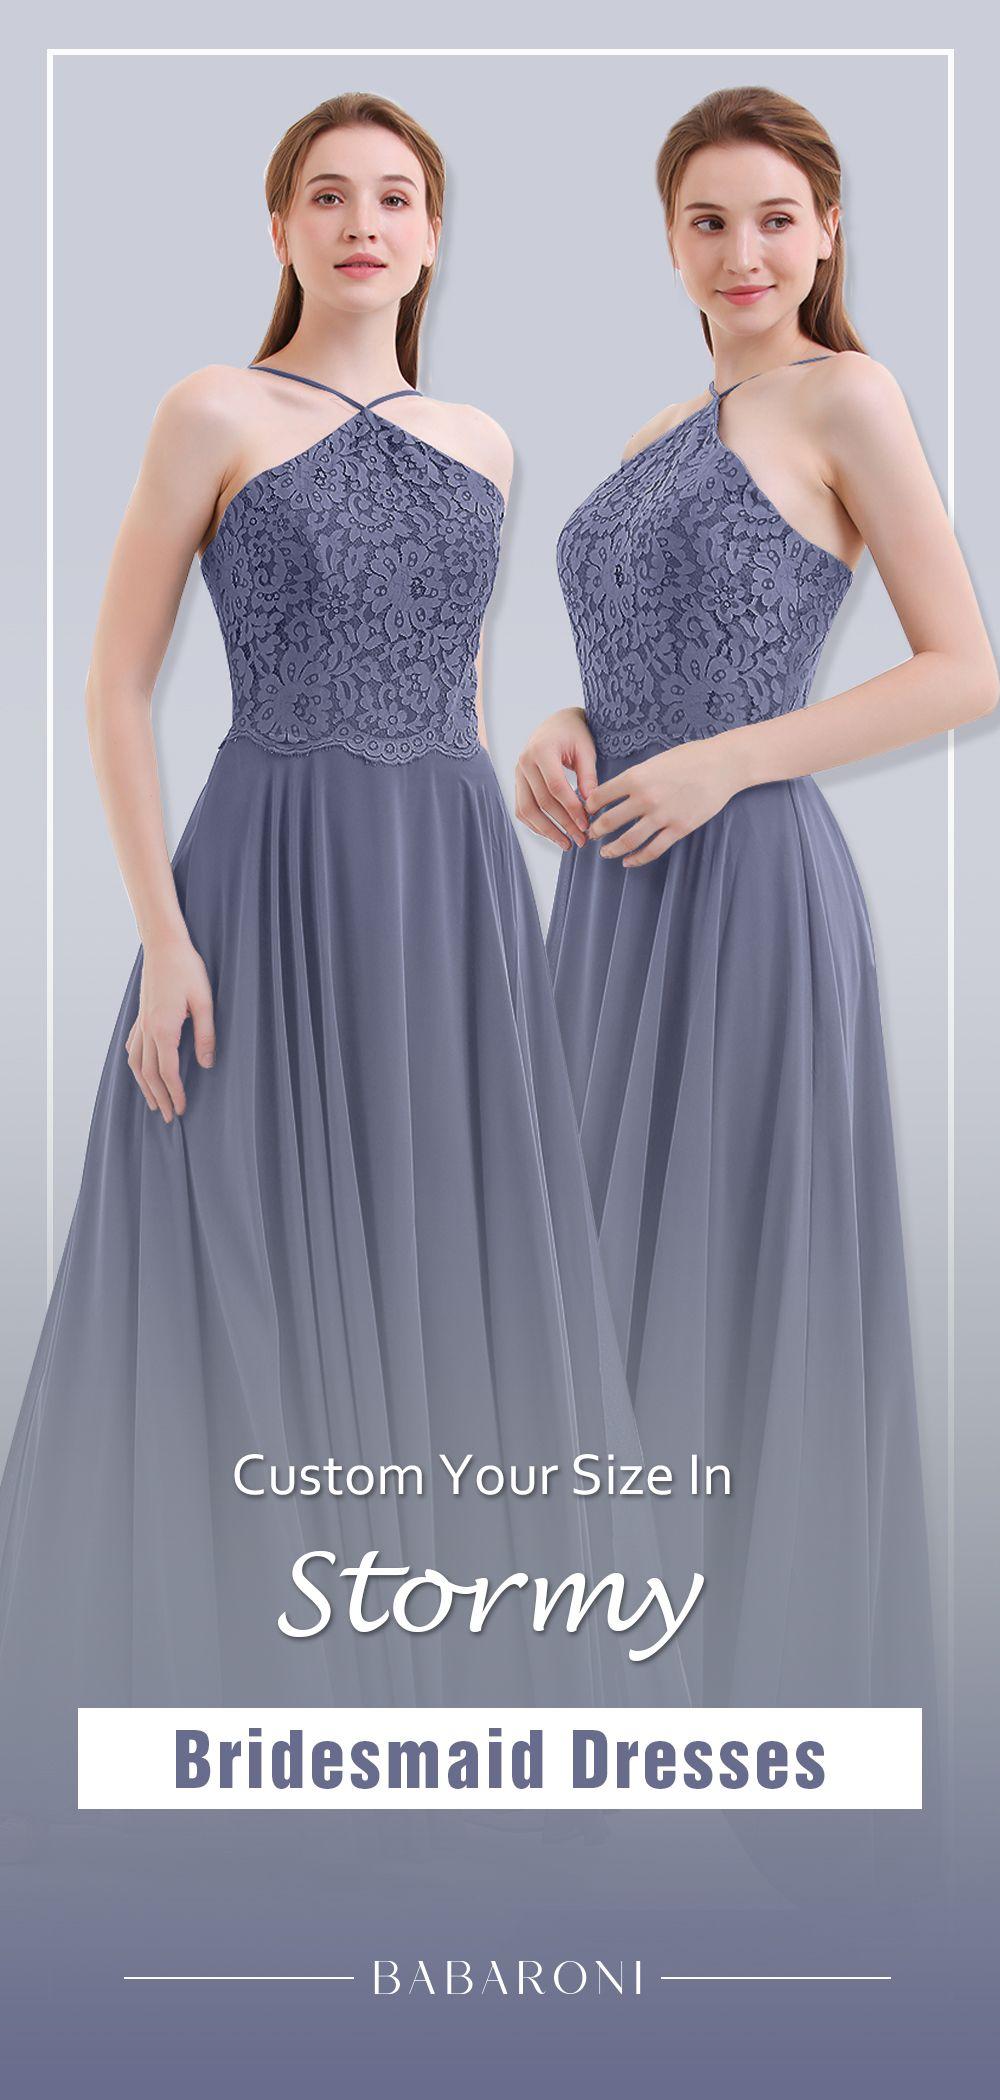 Tallulah in 2020 | Making a wedding dress, Wedding dresses ... |Tallulah Wedding Dress